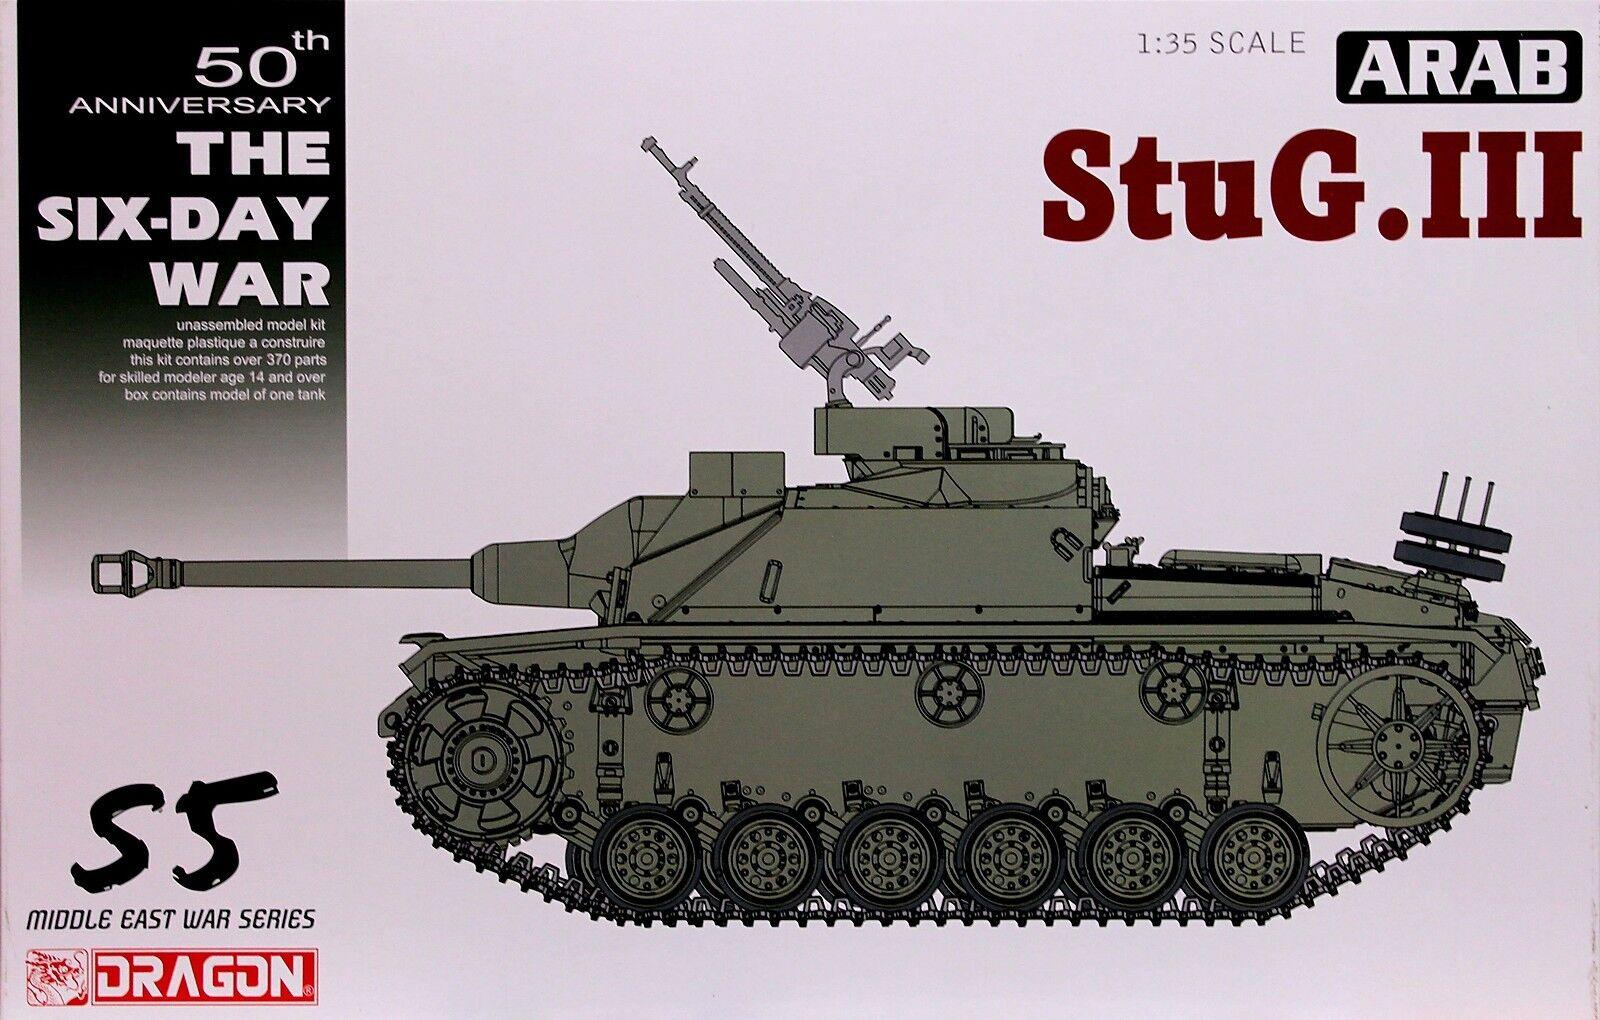 drake 1  35 3601 ARAB StuG.III (sexdagarskriget) (Mellanösterns krigsserie)